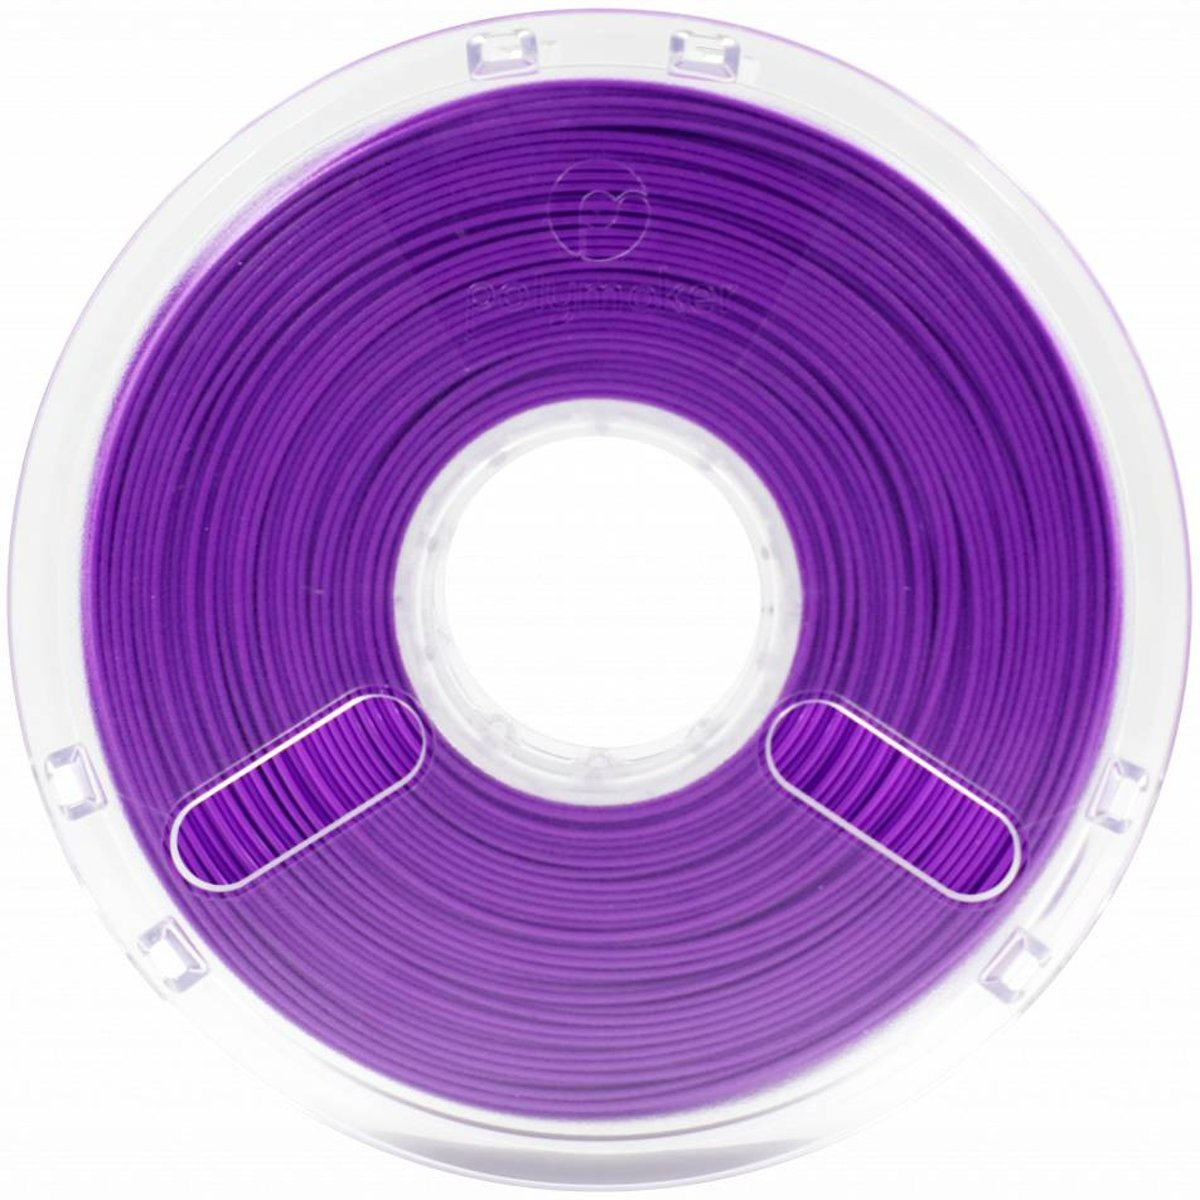 Polymaker Filament voor 3D-printer PolyMax PLA Jam Free Technology 1.75 mm 0.75 kg - True Purple